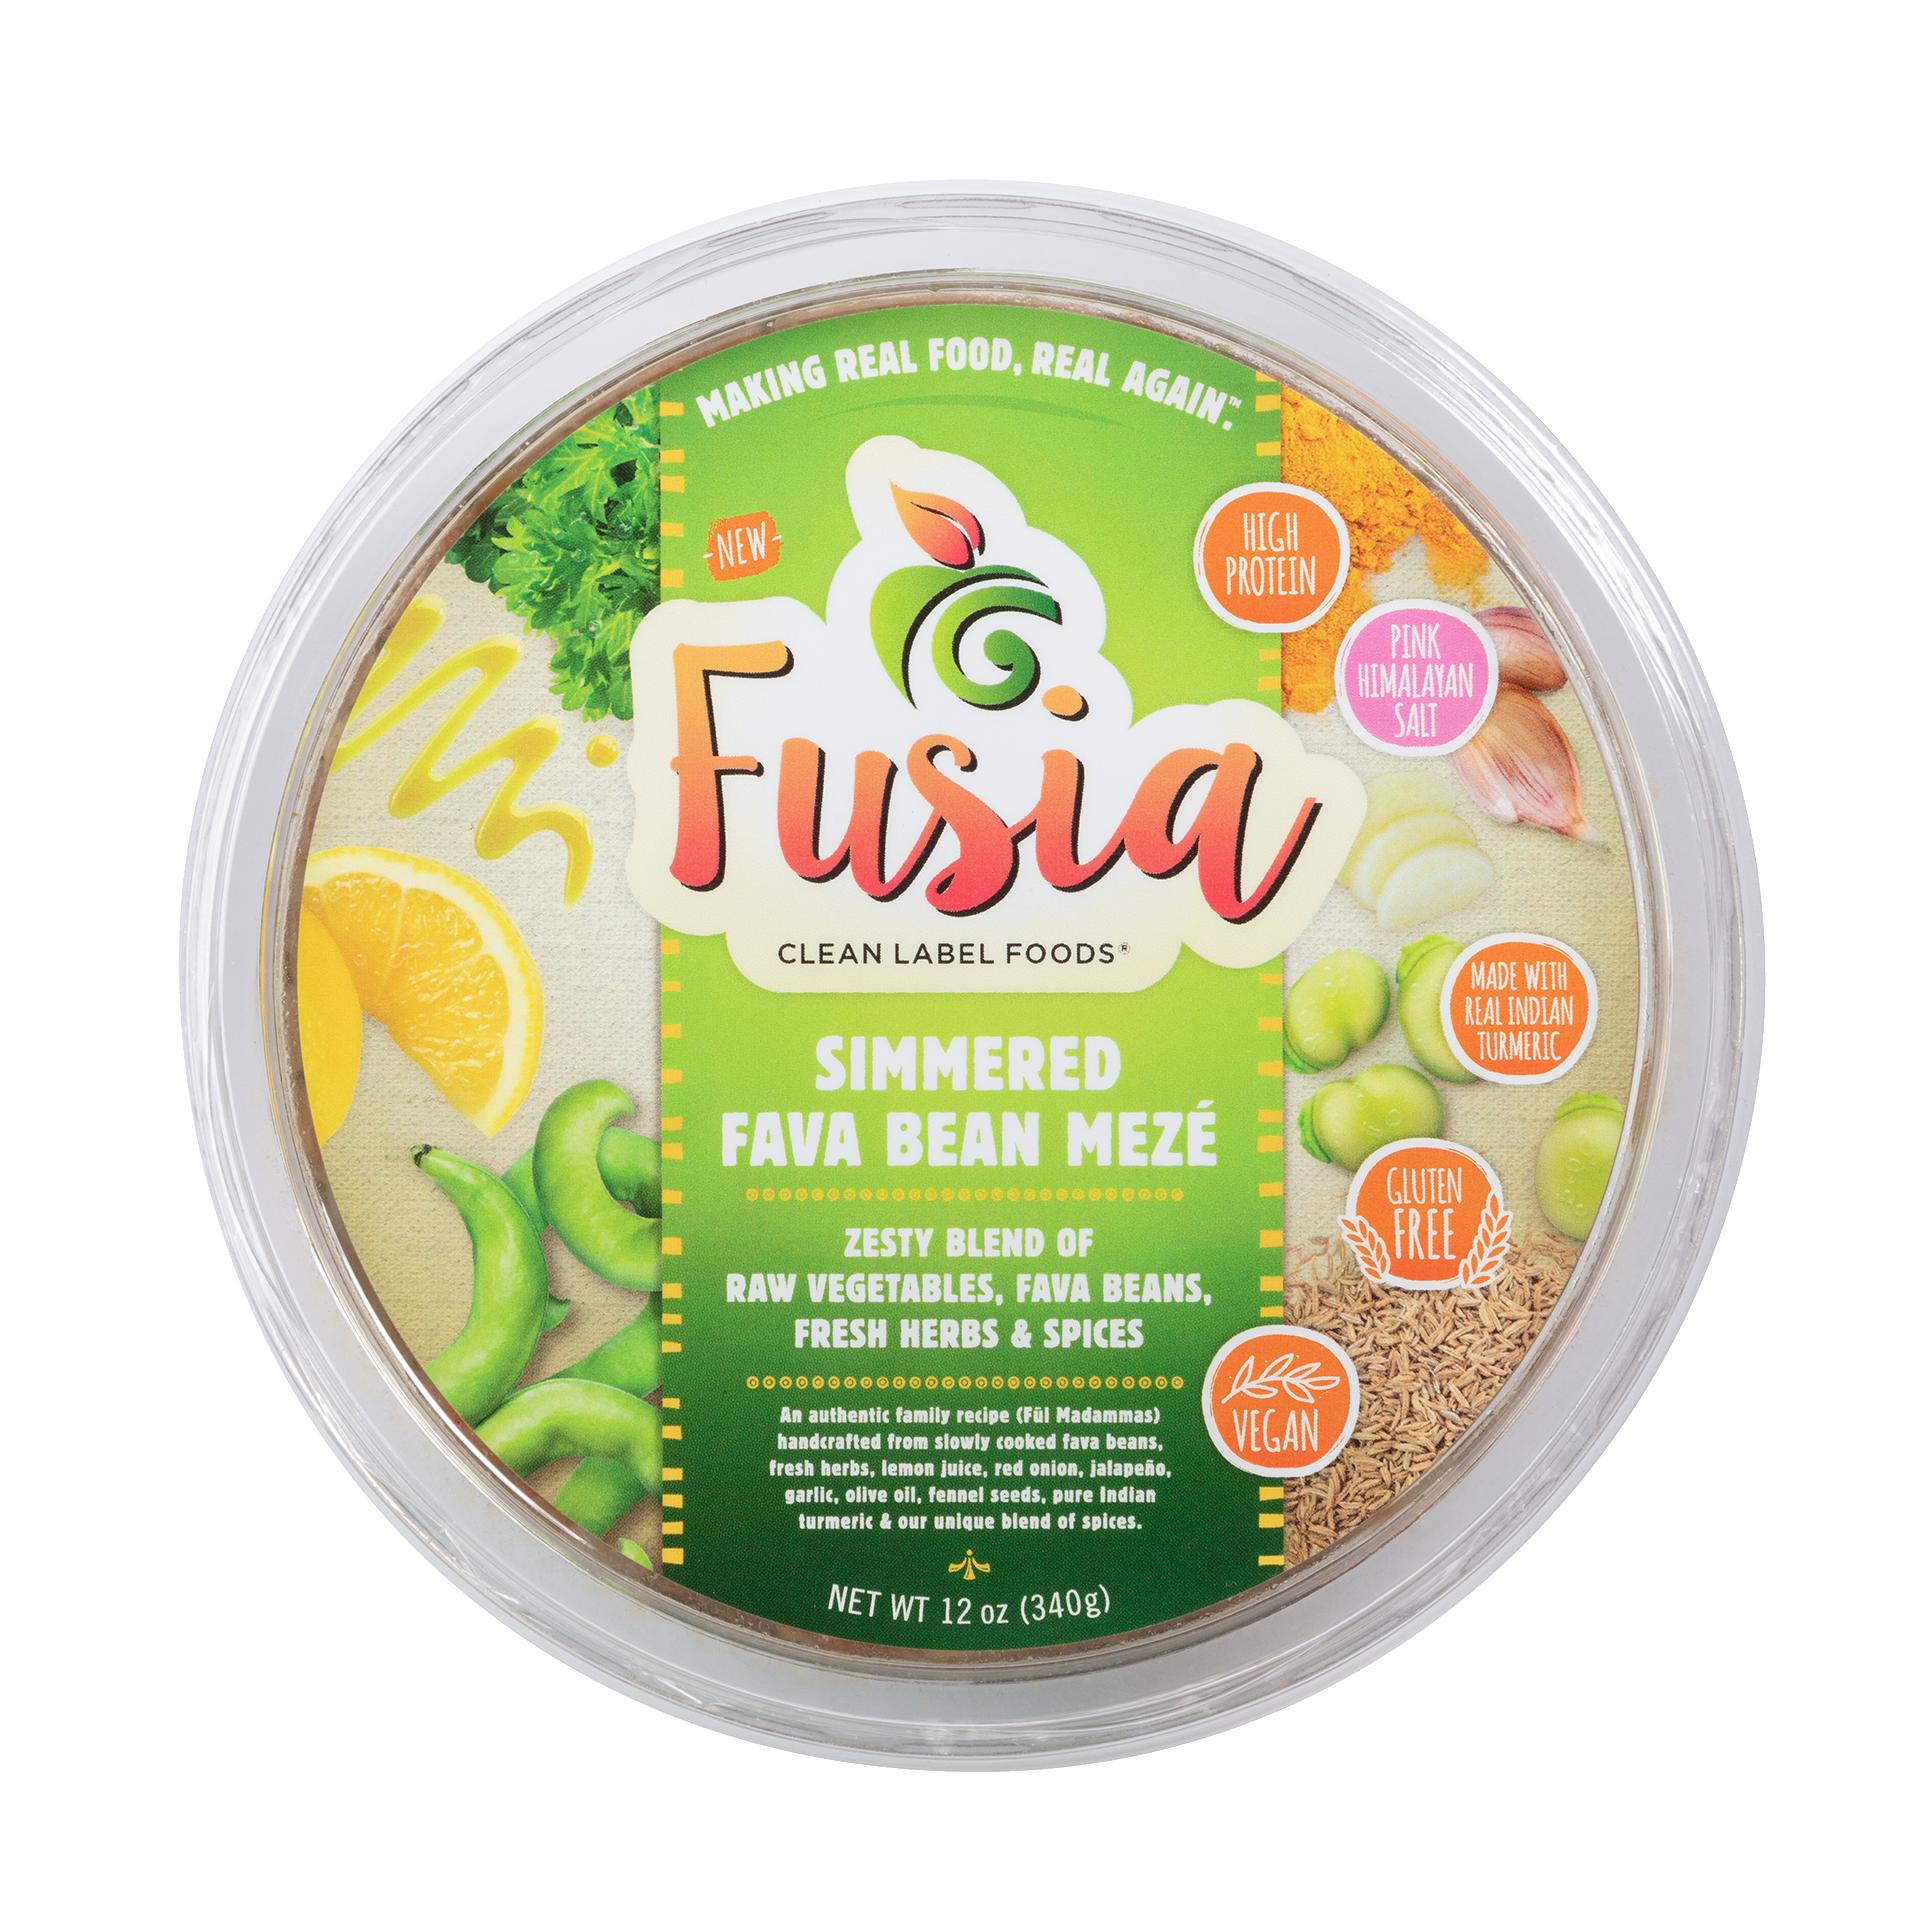 Simmered Fava Bean Meze